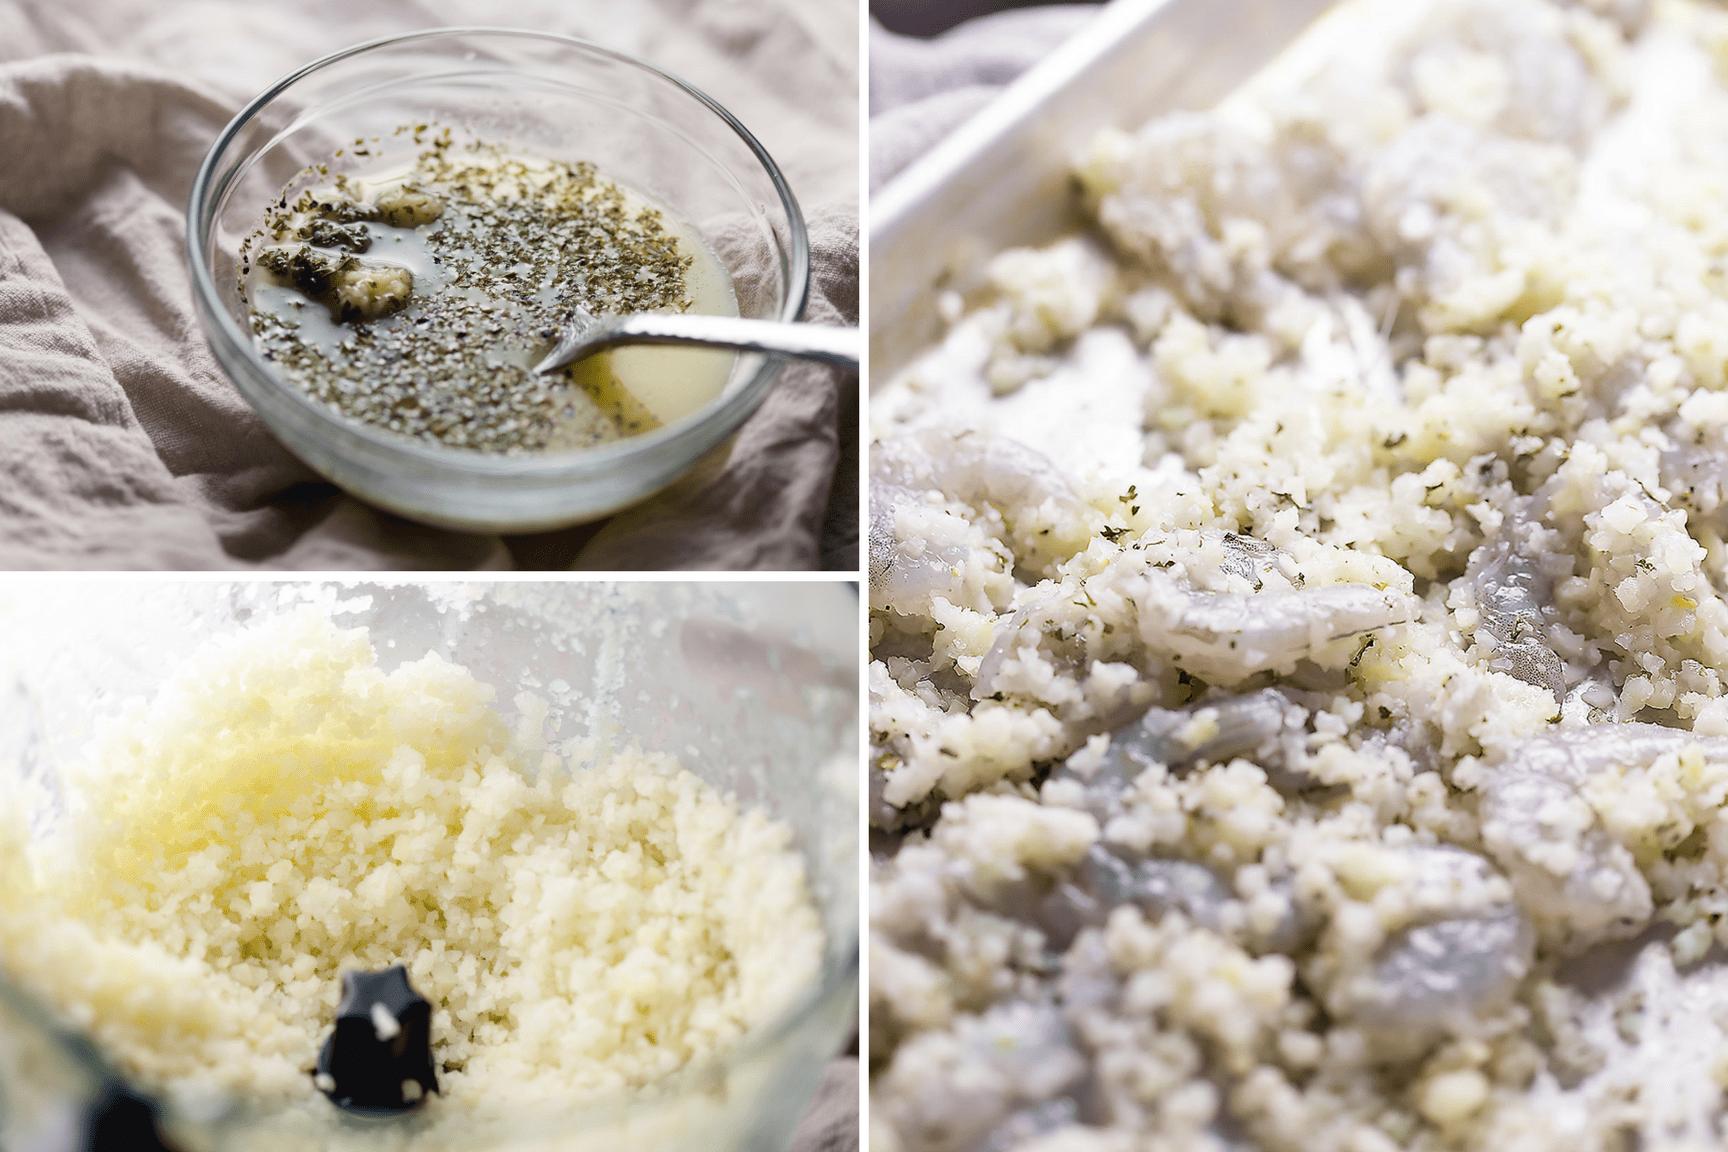 process of making garlic butter shrimp and cauliflower rice